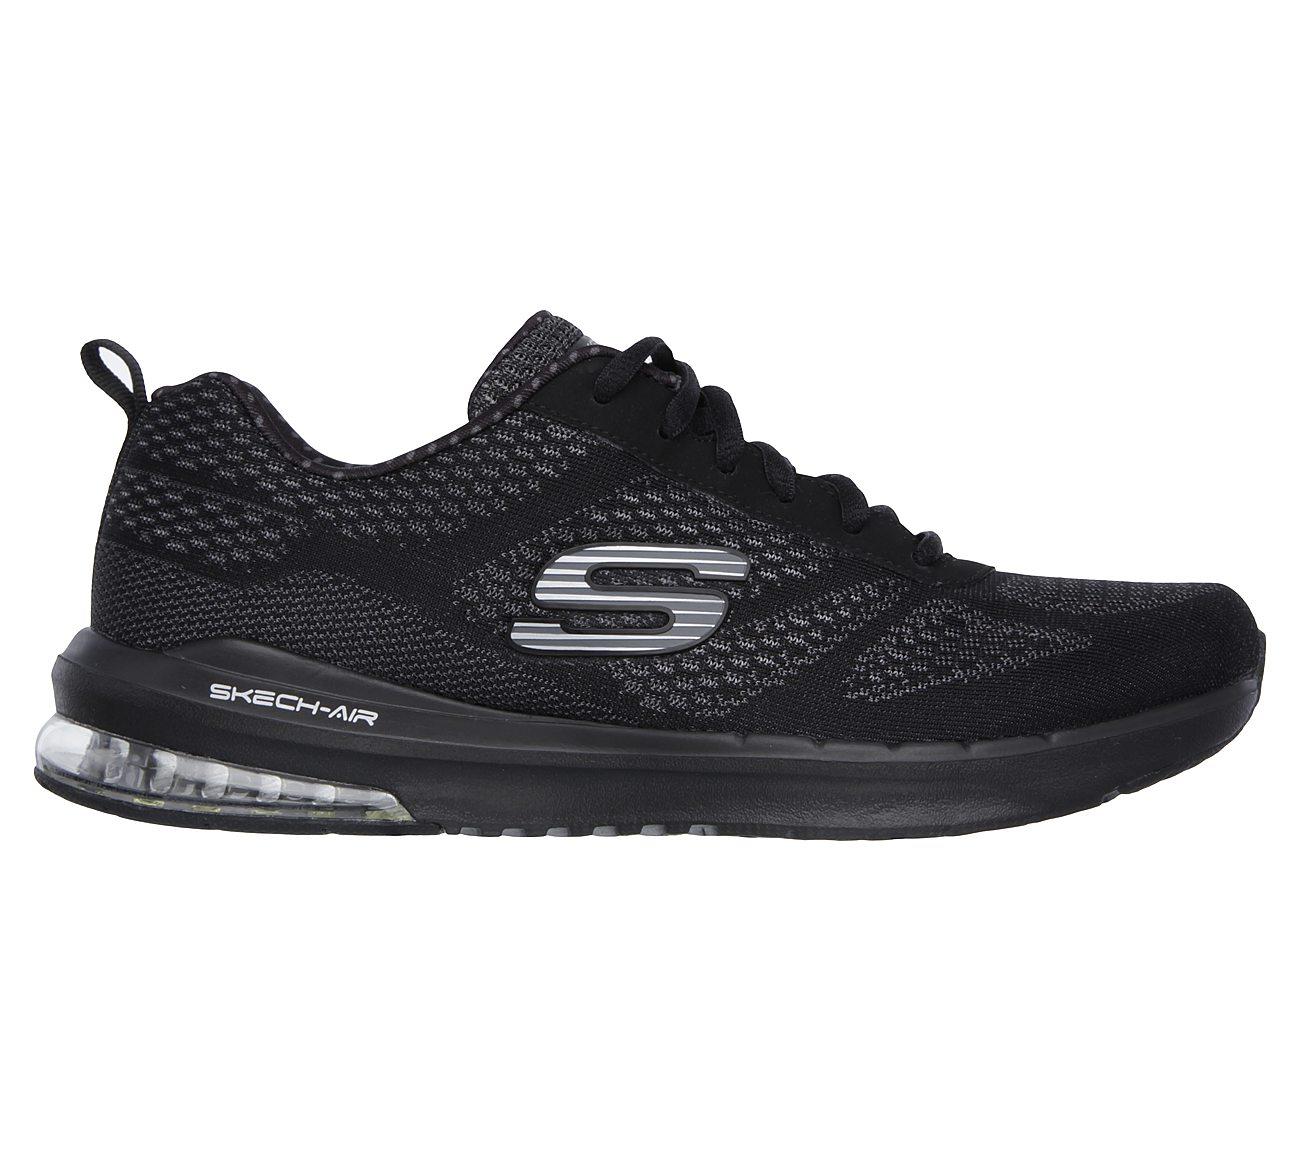 Skechers SKECH AIR INFINITY Black Shoes Low top trainers Women 6yRrlGd8